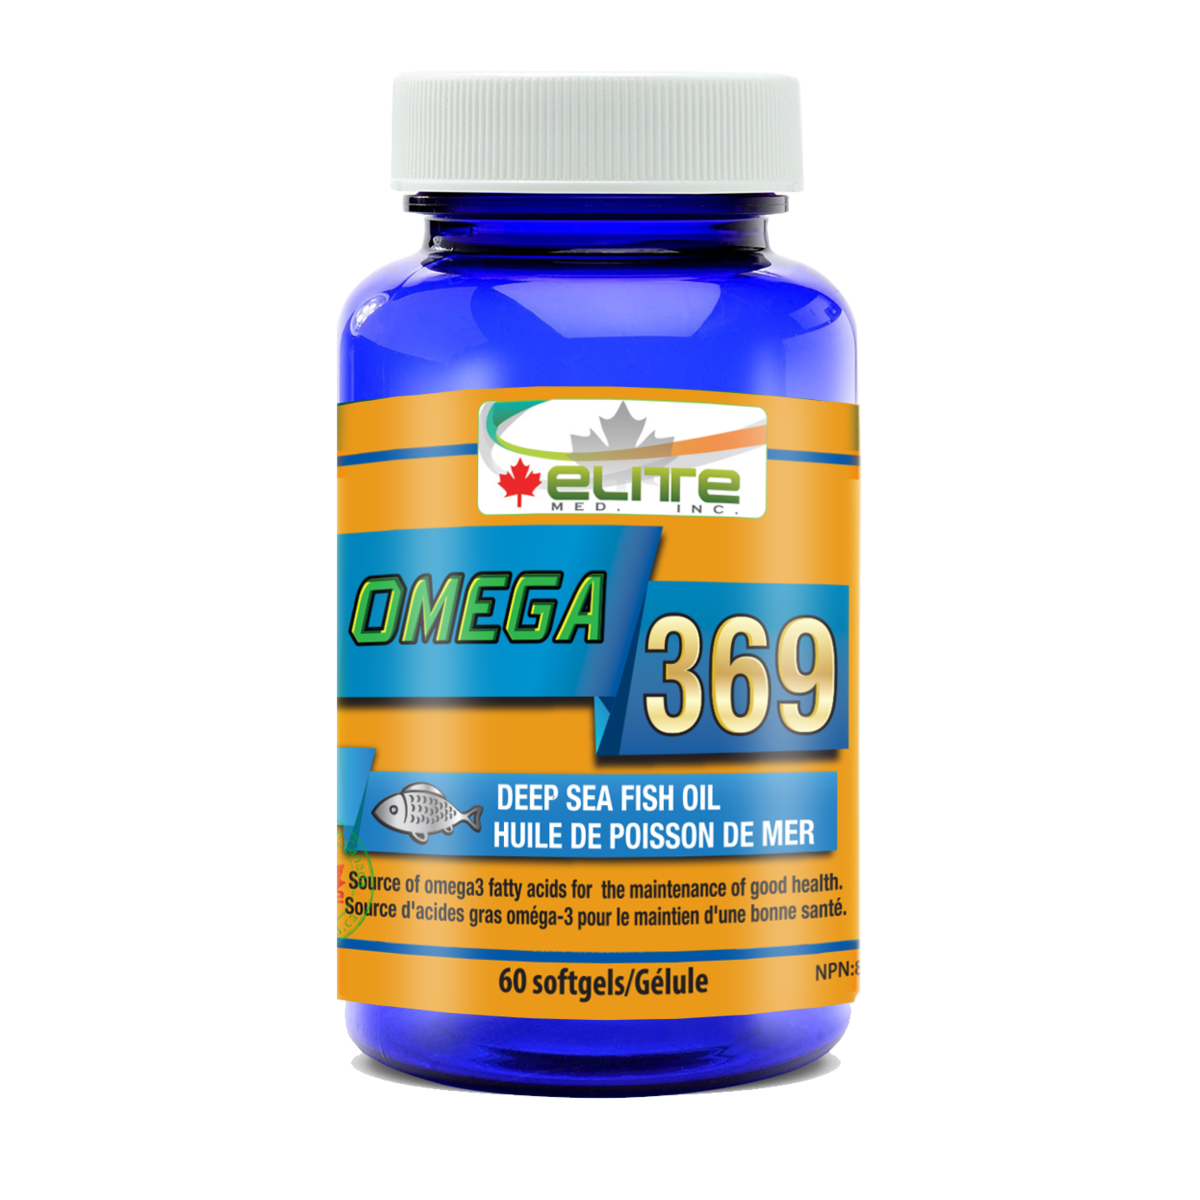 Omega 369 Fish Oil Omega 3 Fish Oil DHA & EPA Supplement